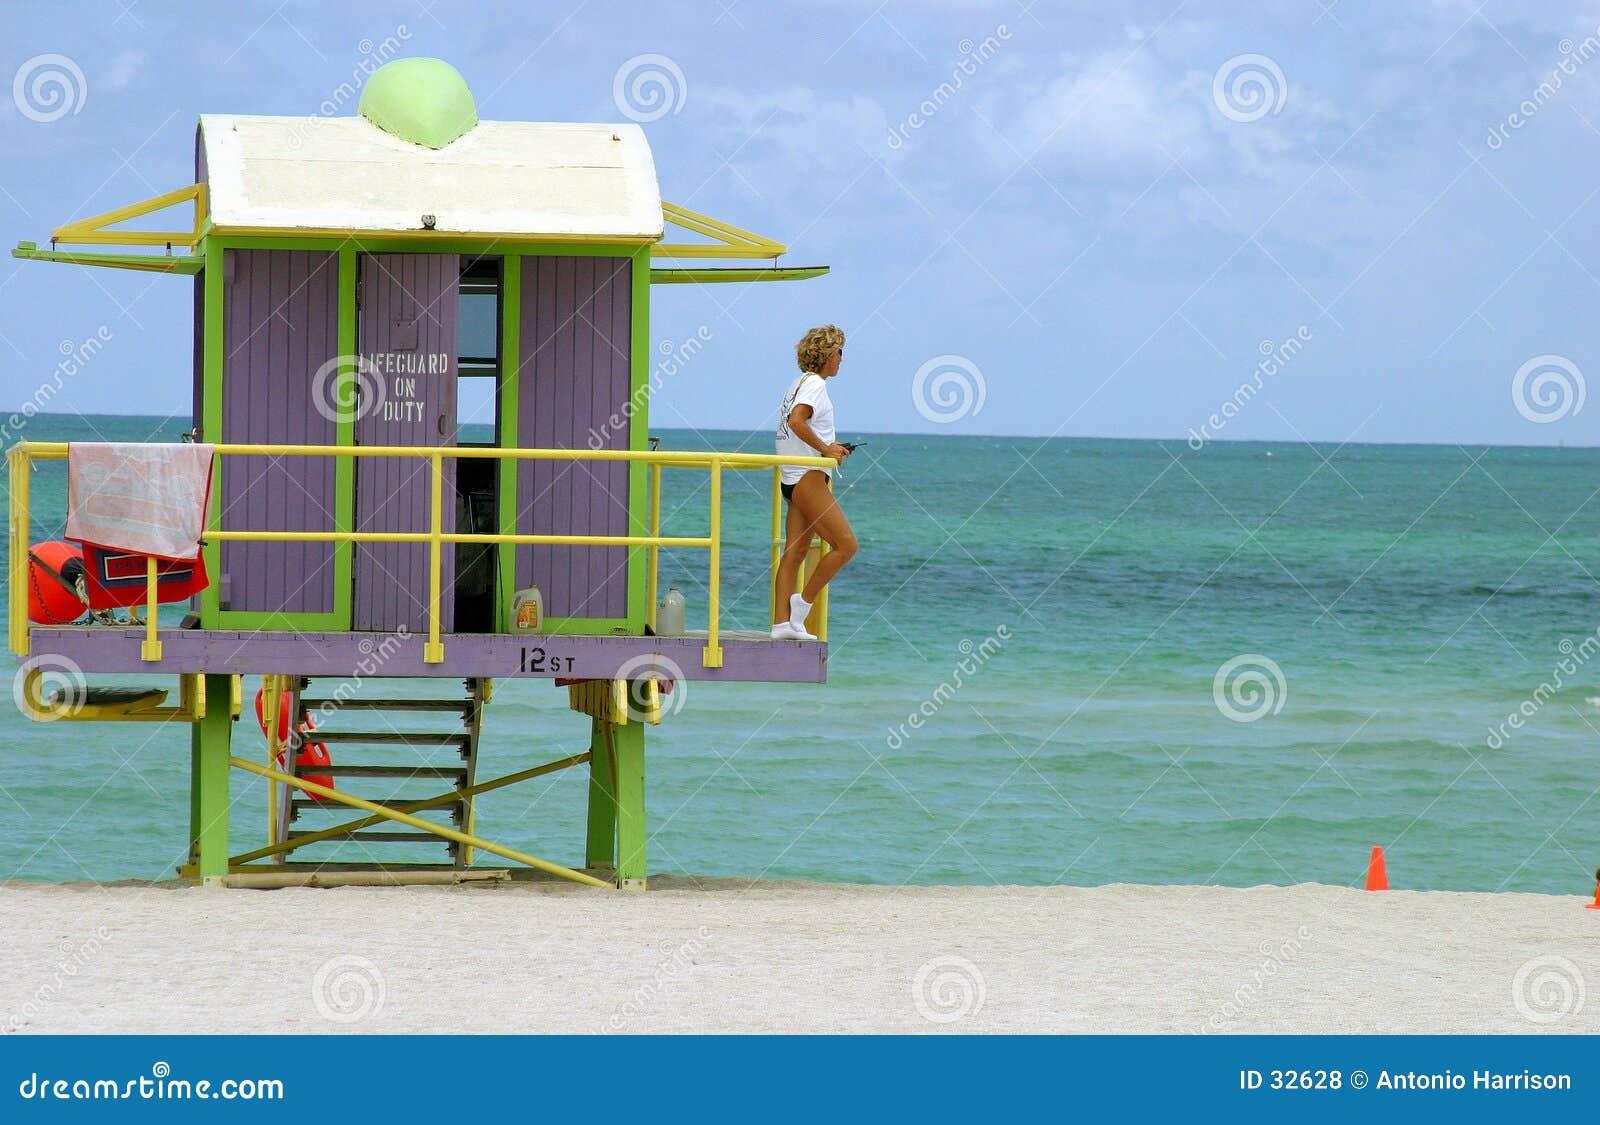 south beach gaurd